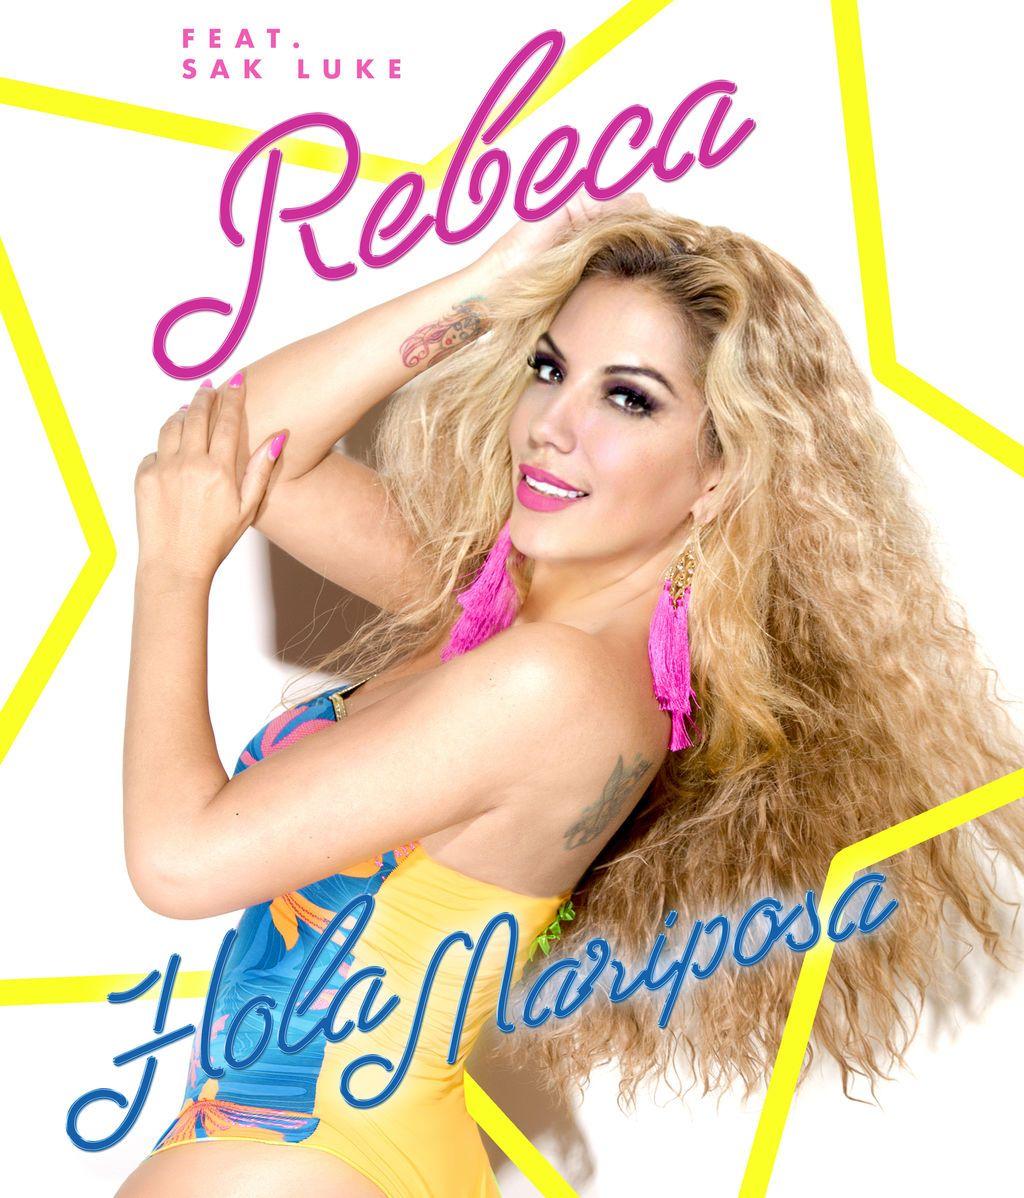 Hola Mariposa - Rebeca